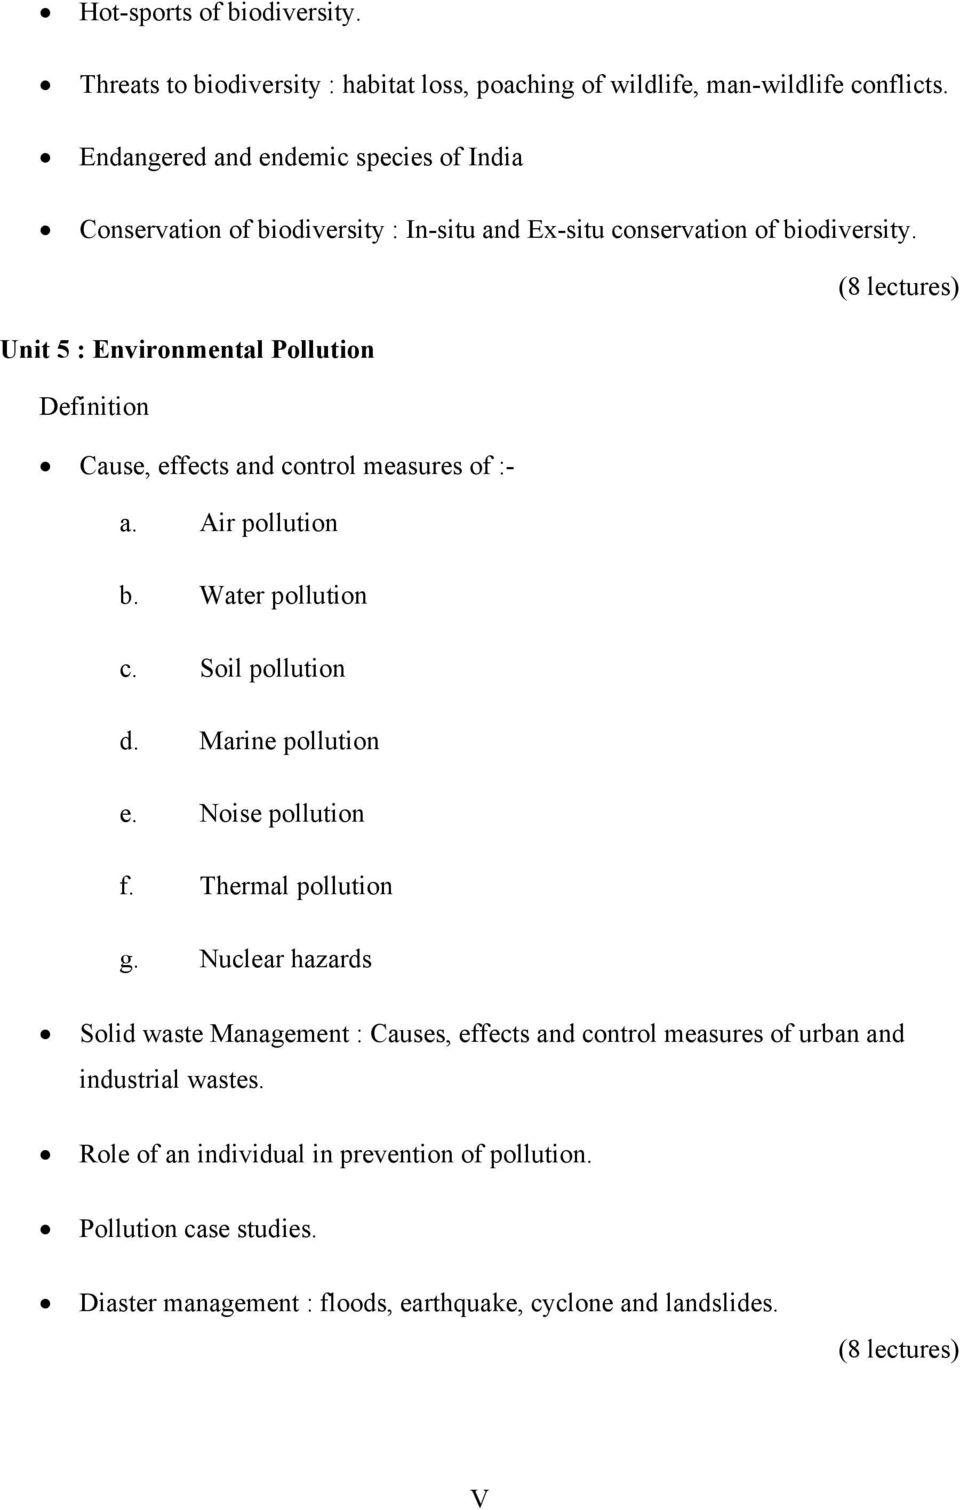 Environmental Studies For Undergraduate Courses Erach